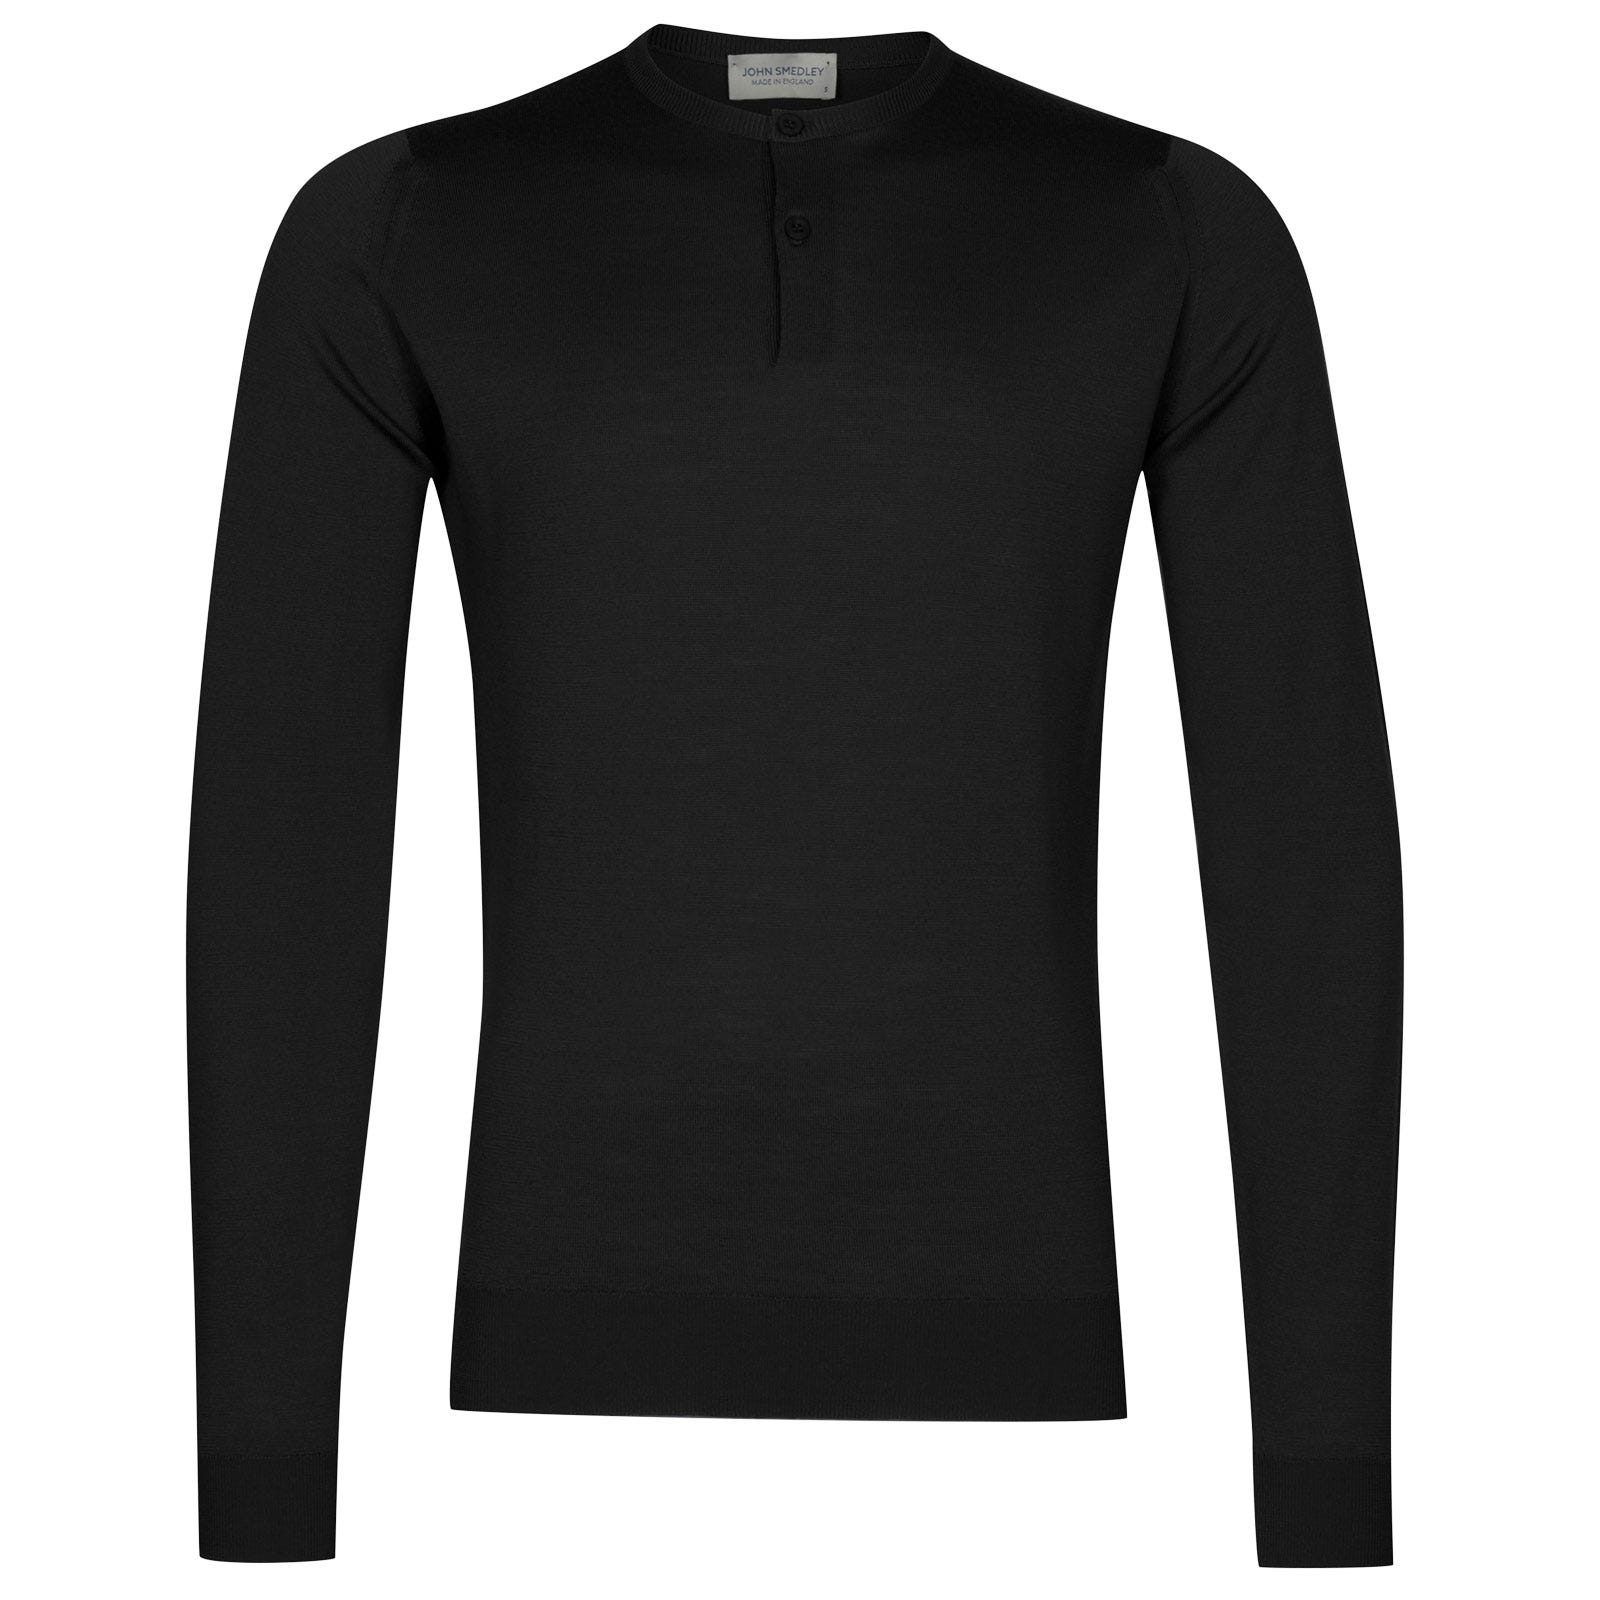 John Smedley russet Merino Wool Henley Shirt in Black-XL